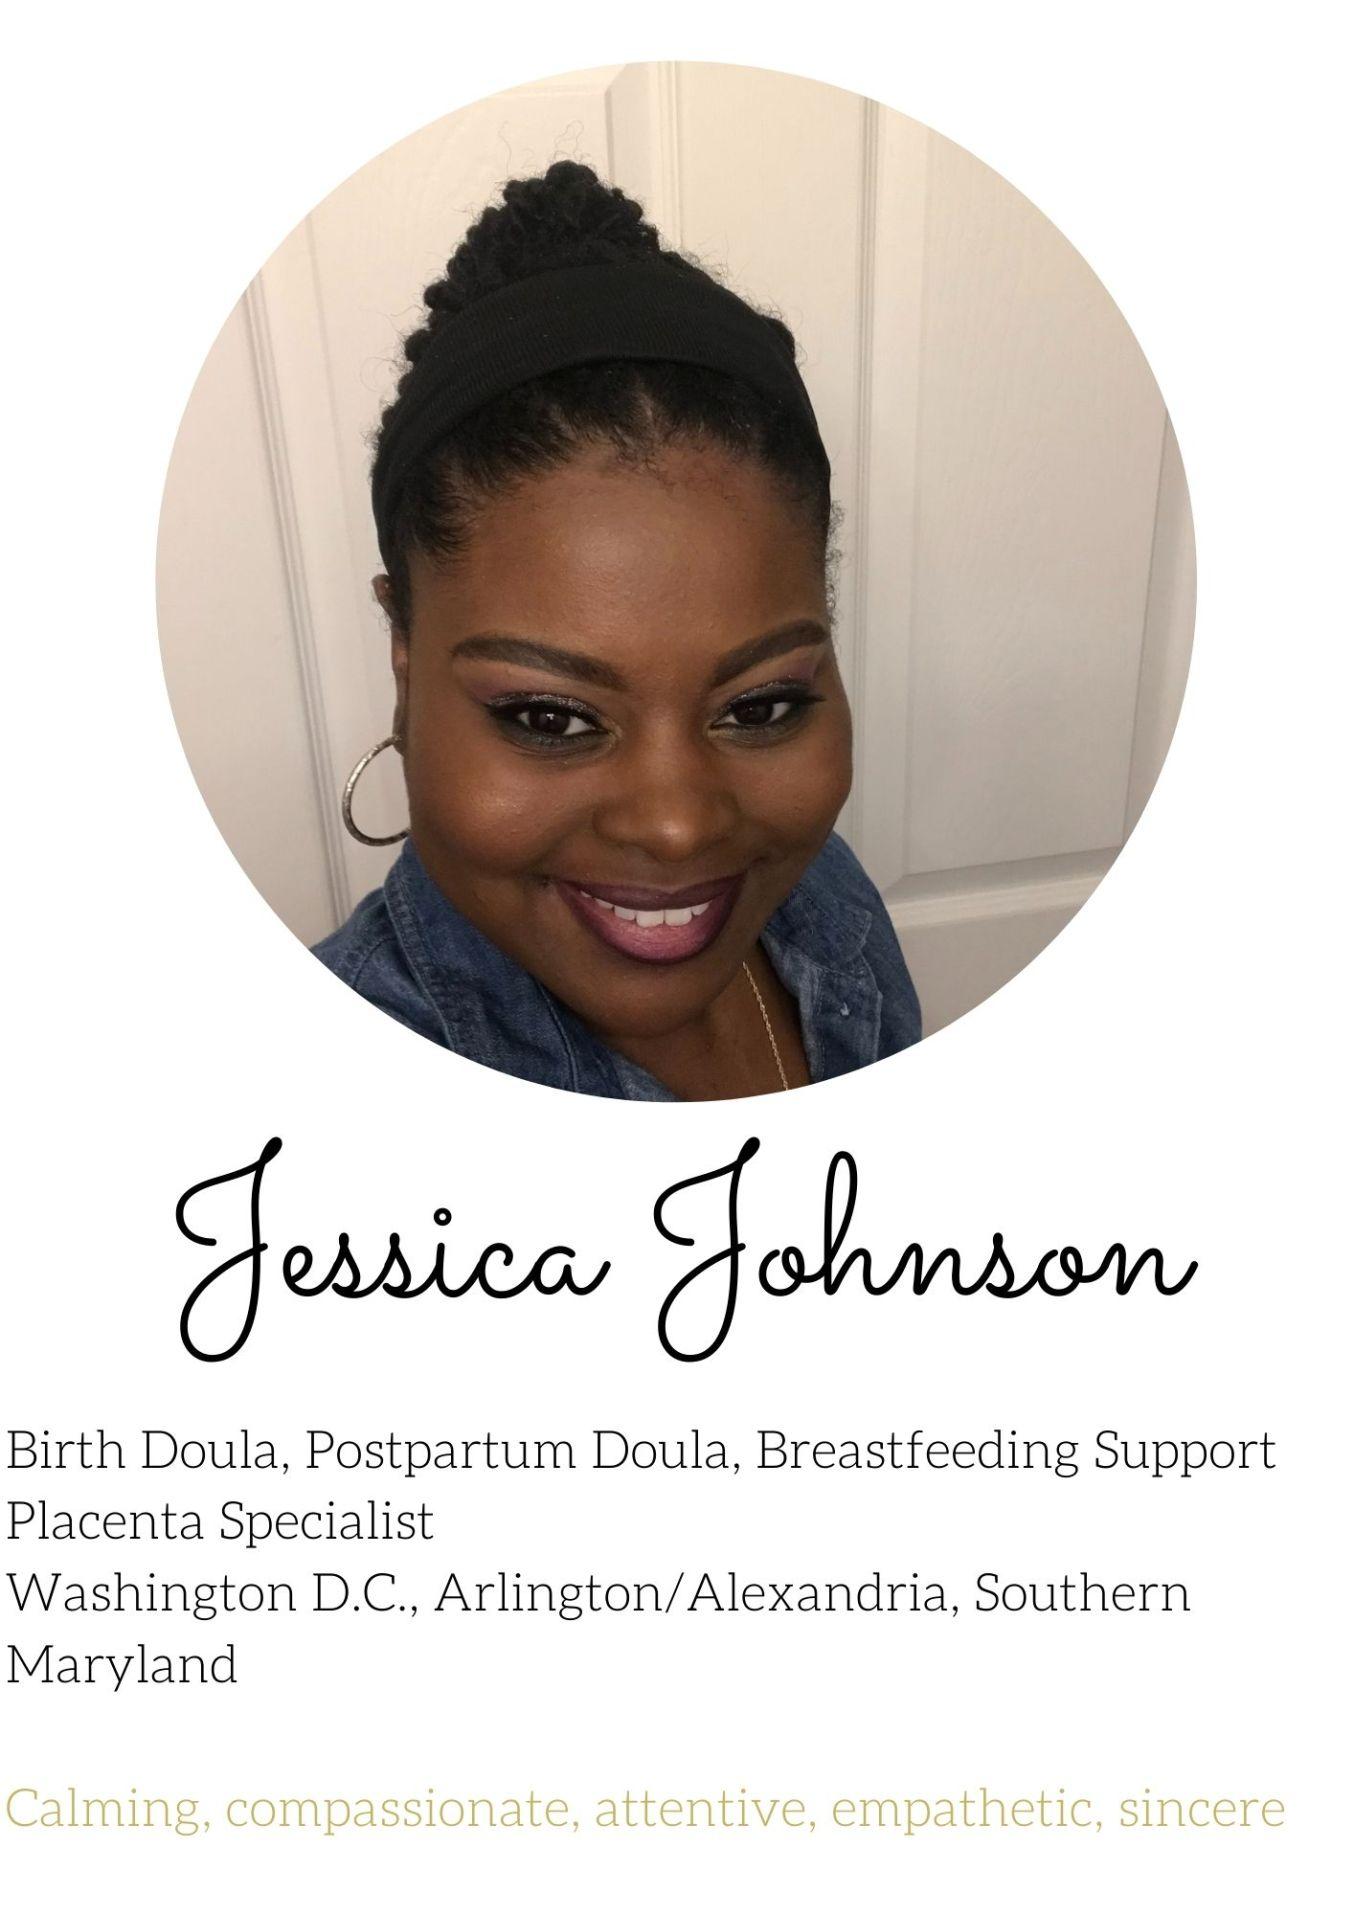 Jessica Johnson Birth Doula, Postpartum Doula, Breastfeeding Support Placenta Specialist Washington D.C., Arlington/Alexandria, Southern Maryland   Calming, compassionate, attentive, empathetic, sincere